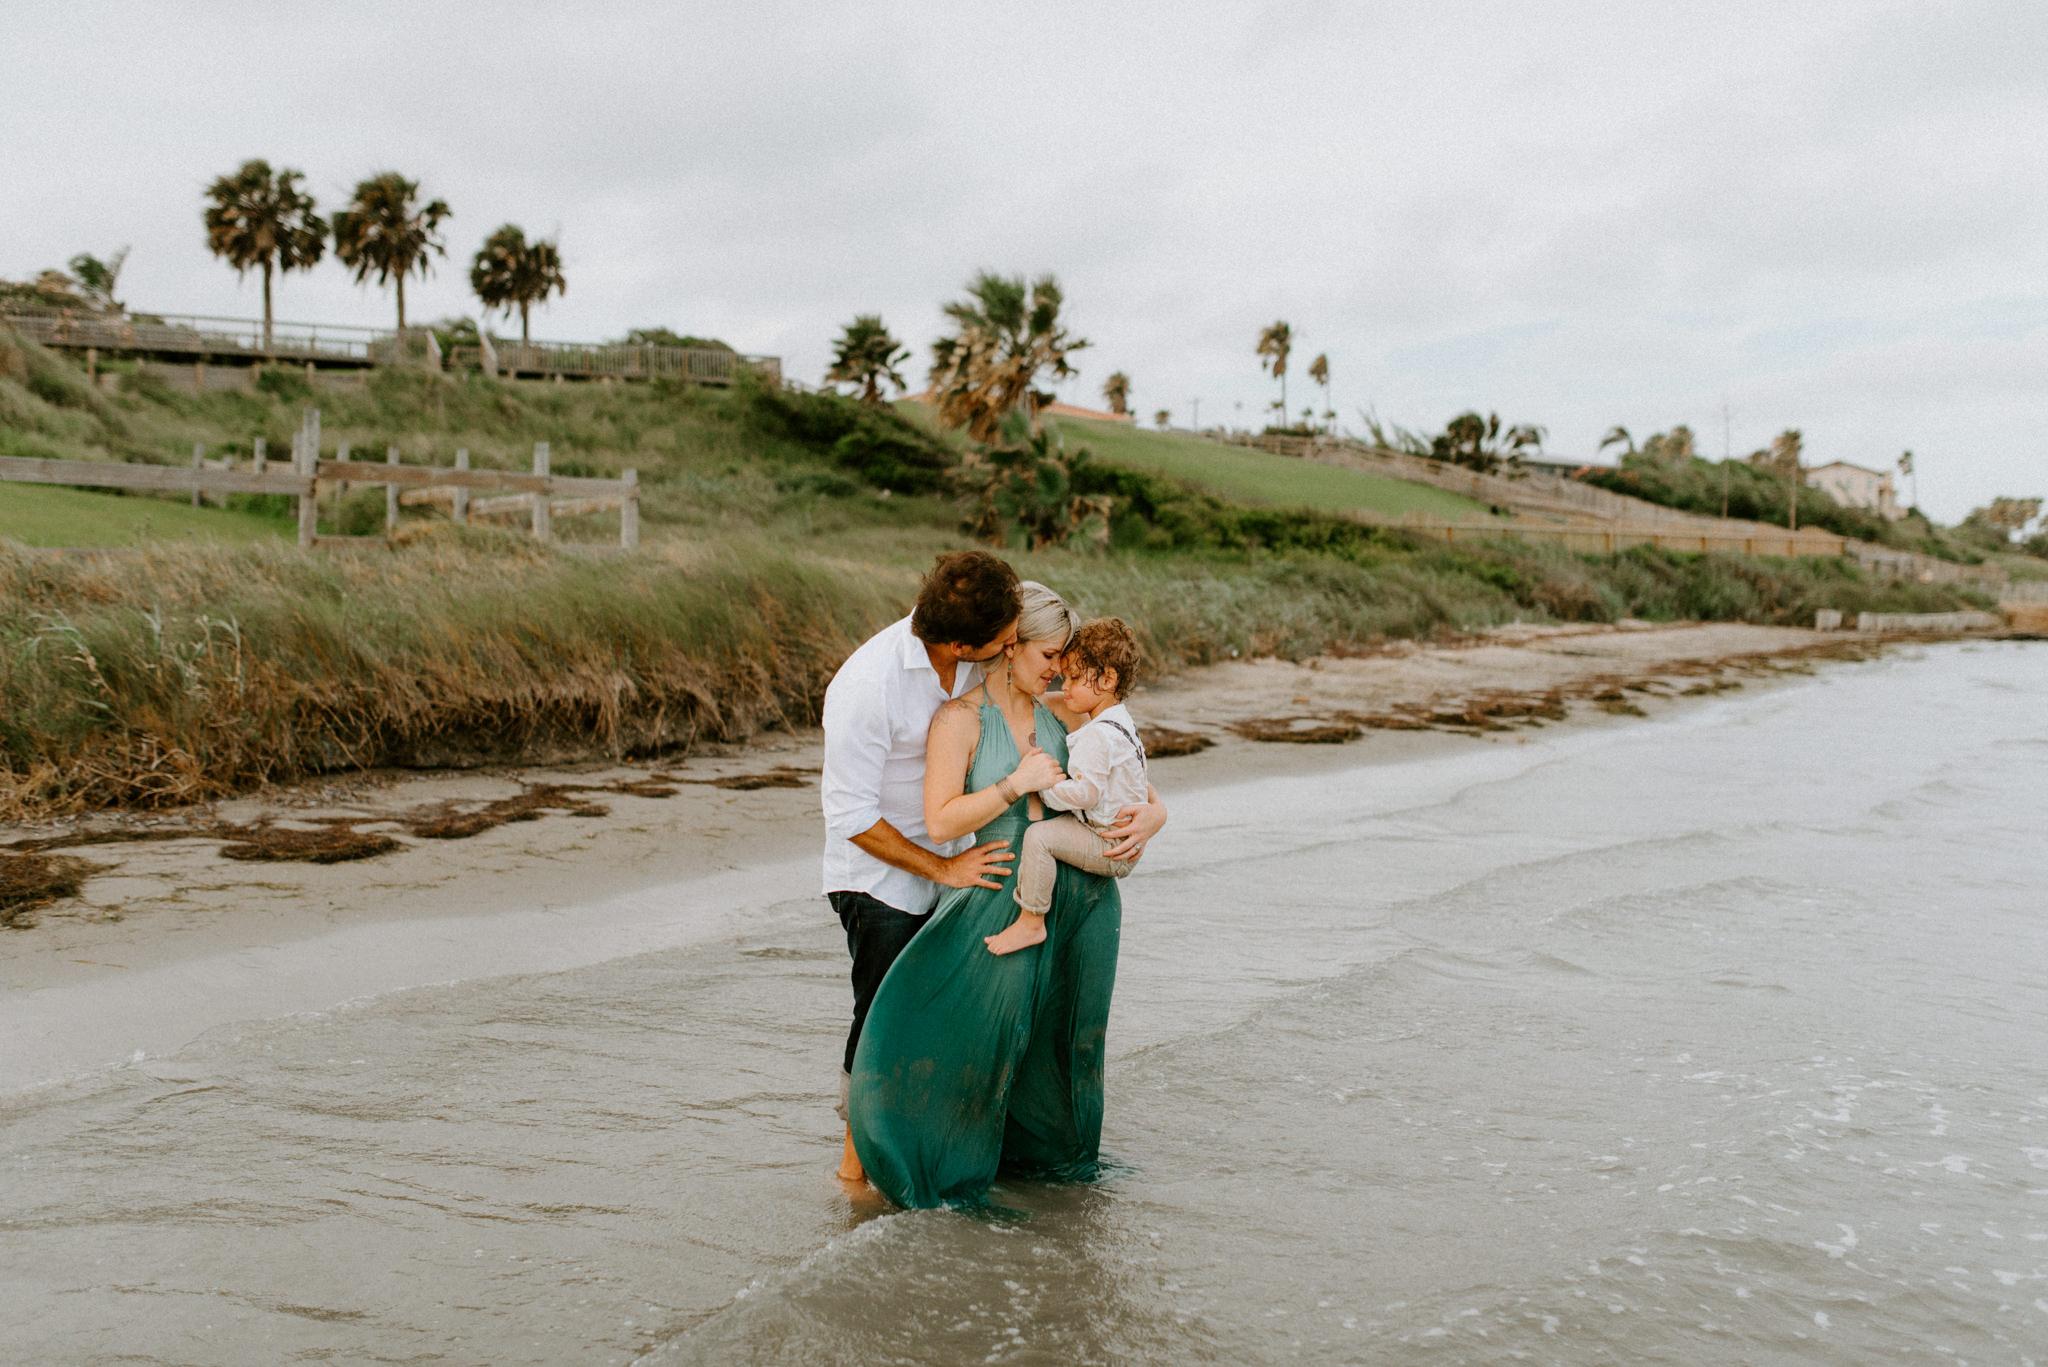 Corpus-Christi-Family-Photographer-Kerlyn-Van-Gelder-Photography118.jpg